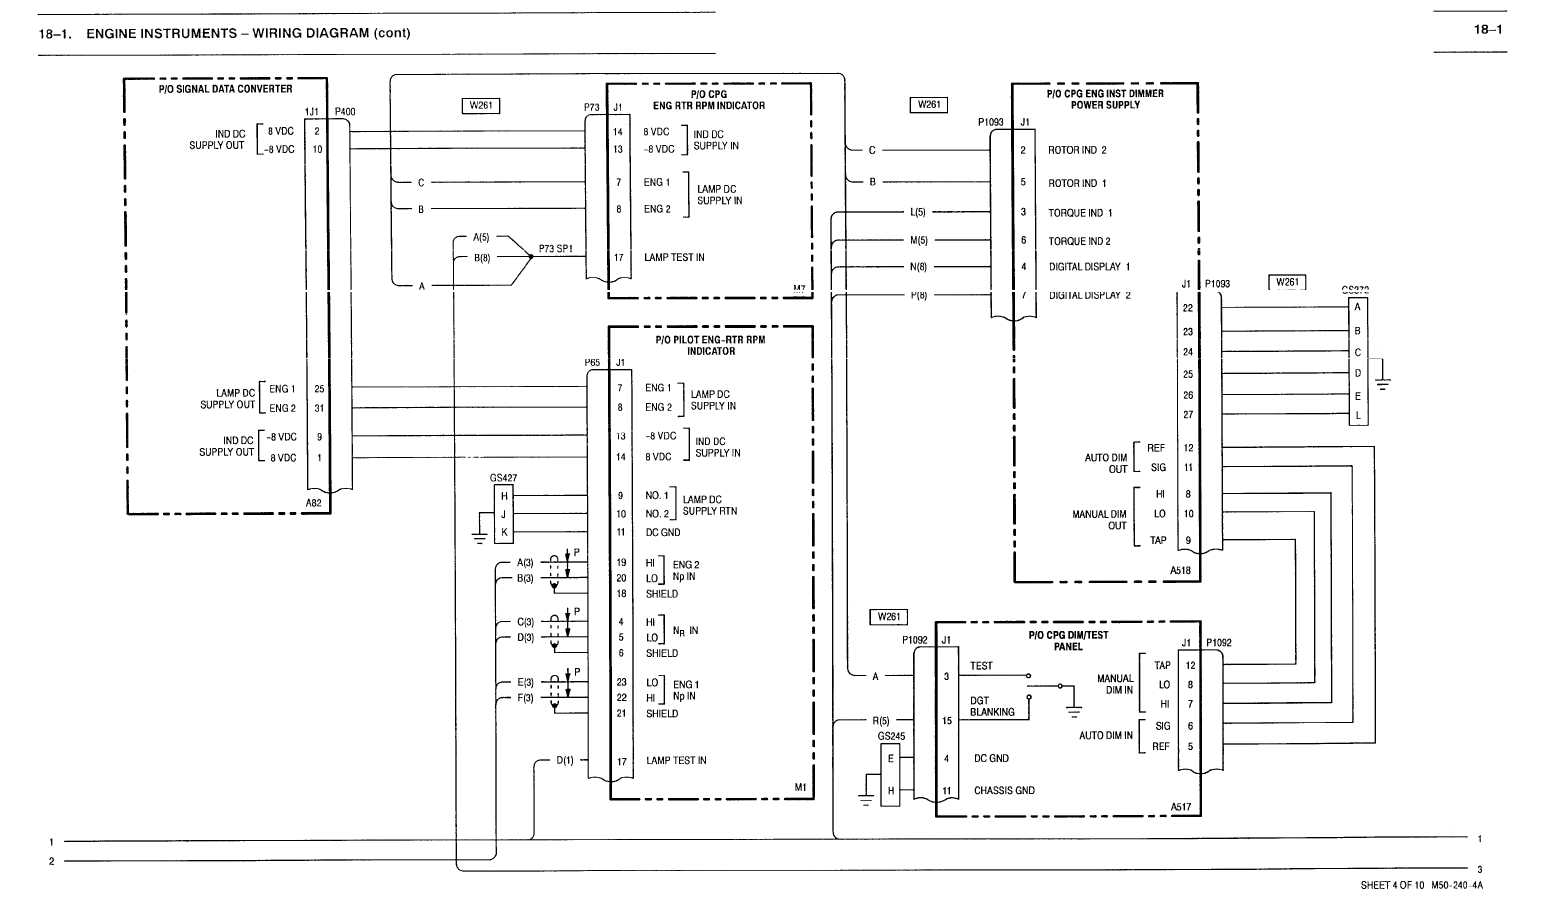 18-1  engine instruments -wiring diagram  cont